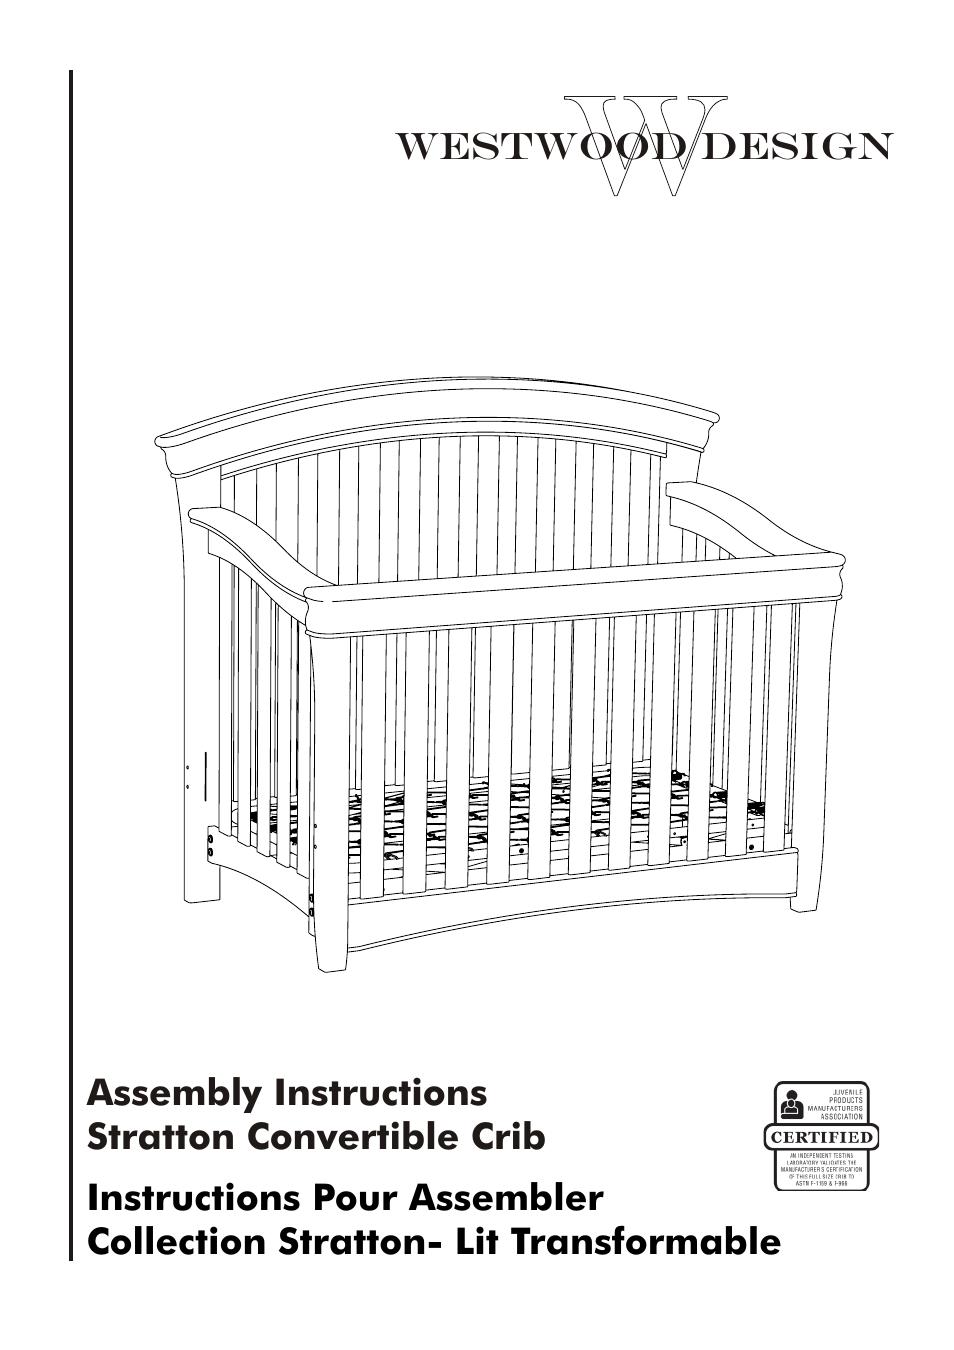 Westwood Design Stratton Convertible Crib Manuel d